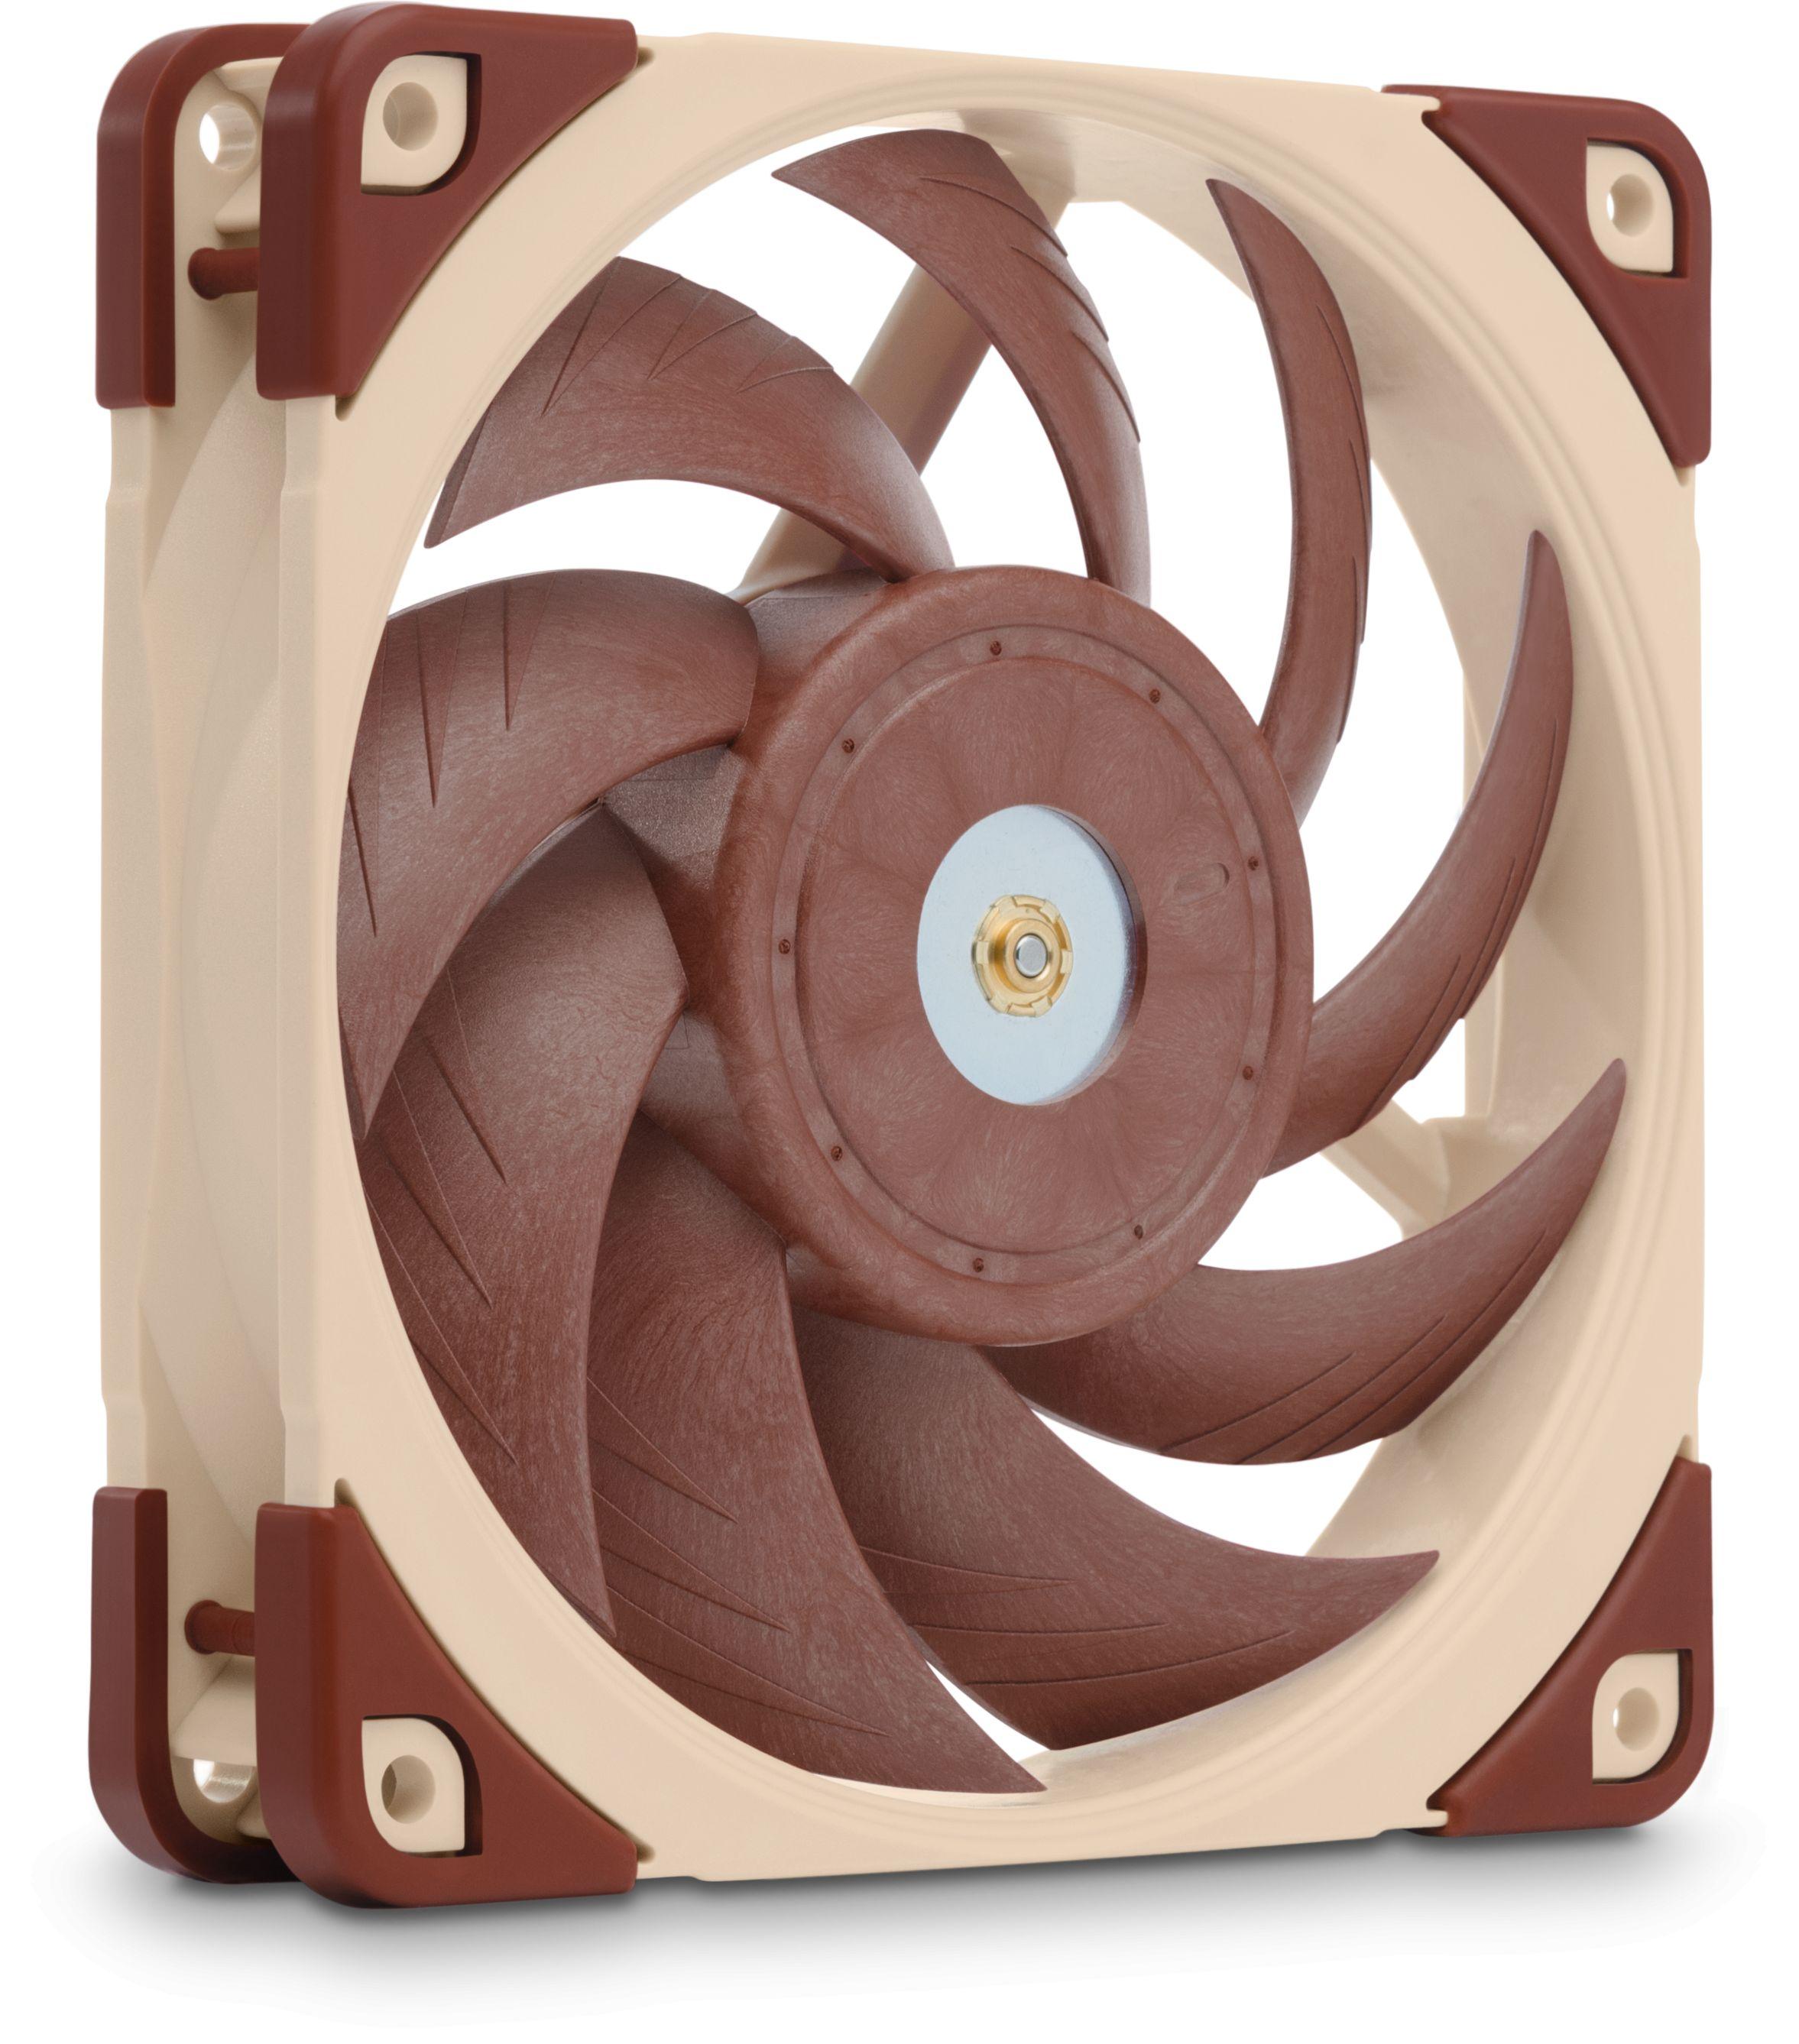 Noctua NF-P12 redux-900 900 RPM 3-Pin 120mm, Grey Ultra Quiet Silent Fan